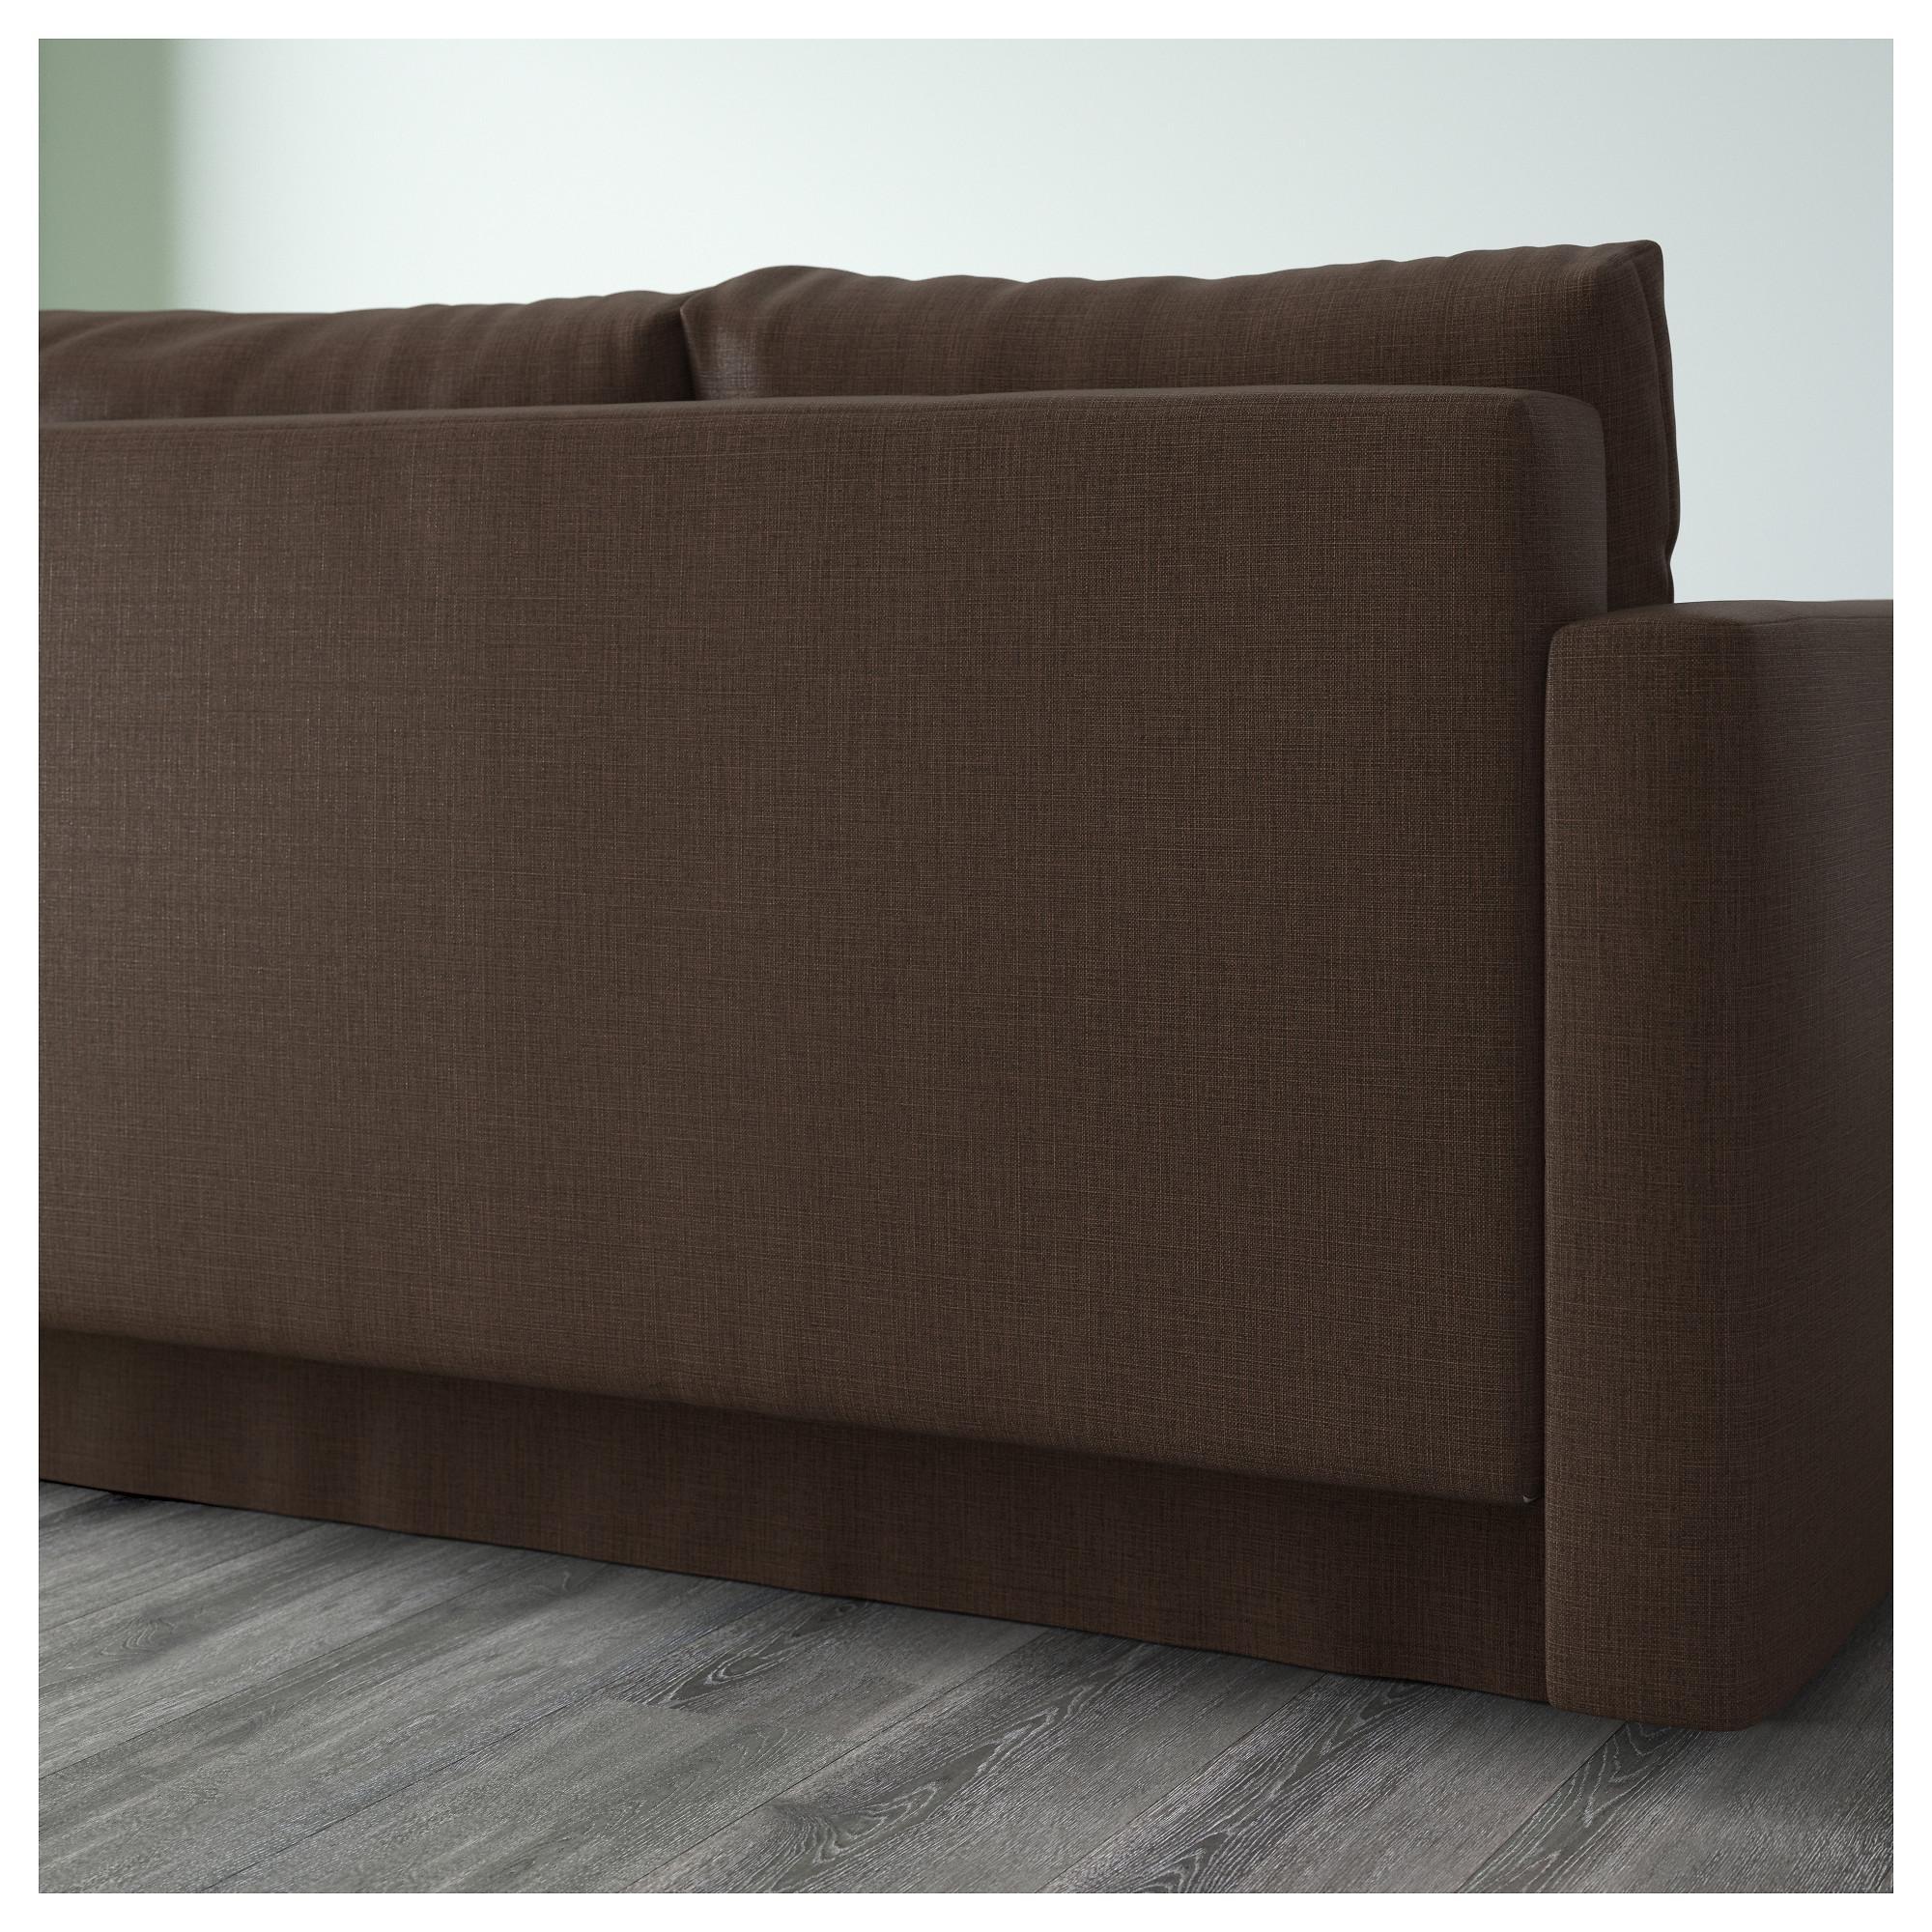 Friheten Corner Sofa Bed With Storage Skiftebo Brown – Ikea Throughout Ikea Corner Sofa Bed With Storage (Image 6 of 20)